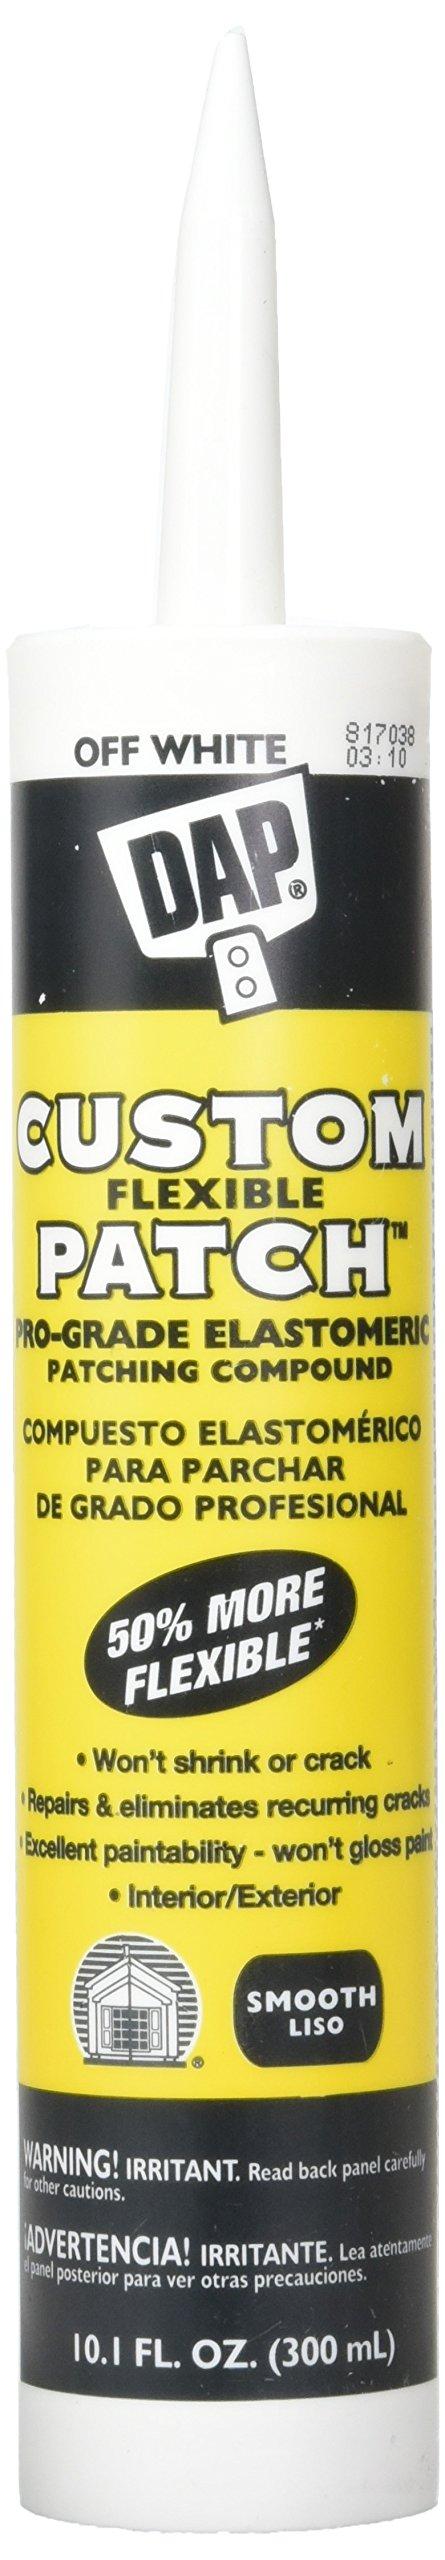 DAP 12274 Smooth Custom Flexible Patch, 10.1 oz